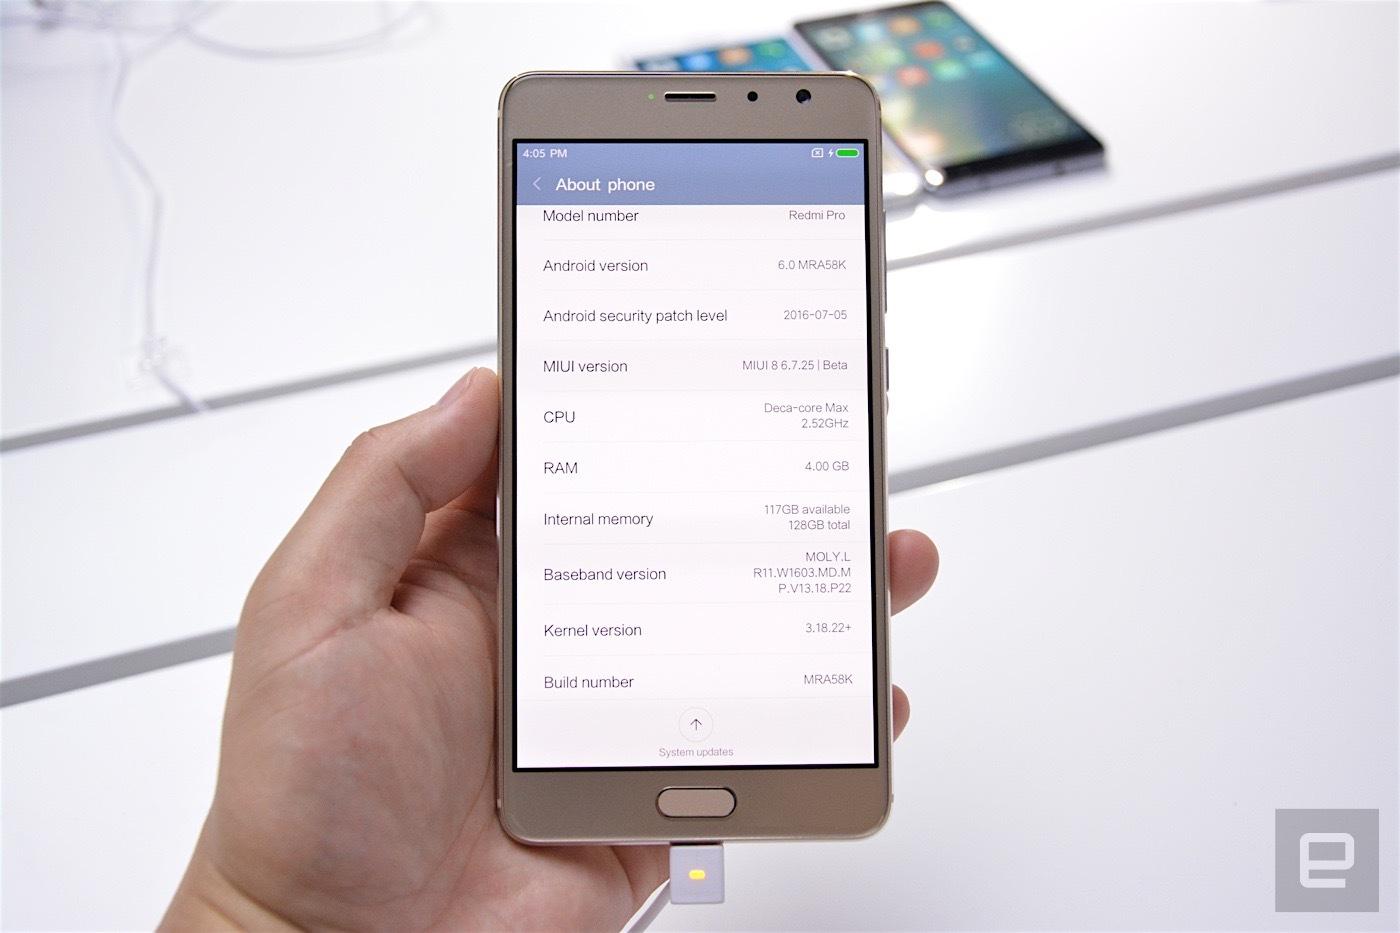 Nên mua Xiaomi Redmi Pro hay Redmi Note 4? - Tư vấn mua điện thoai